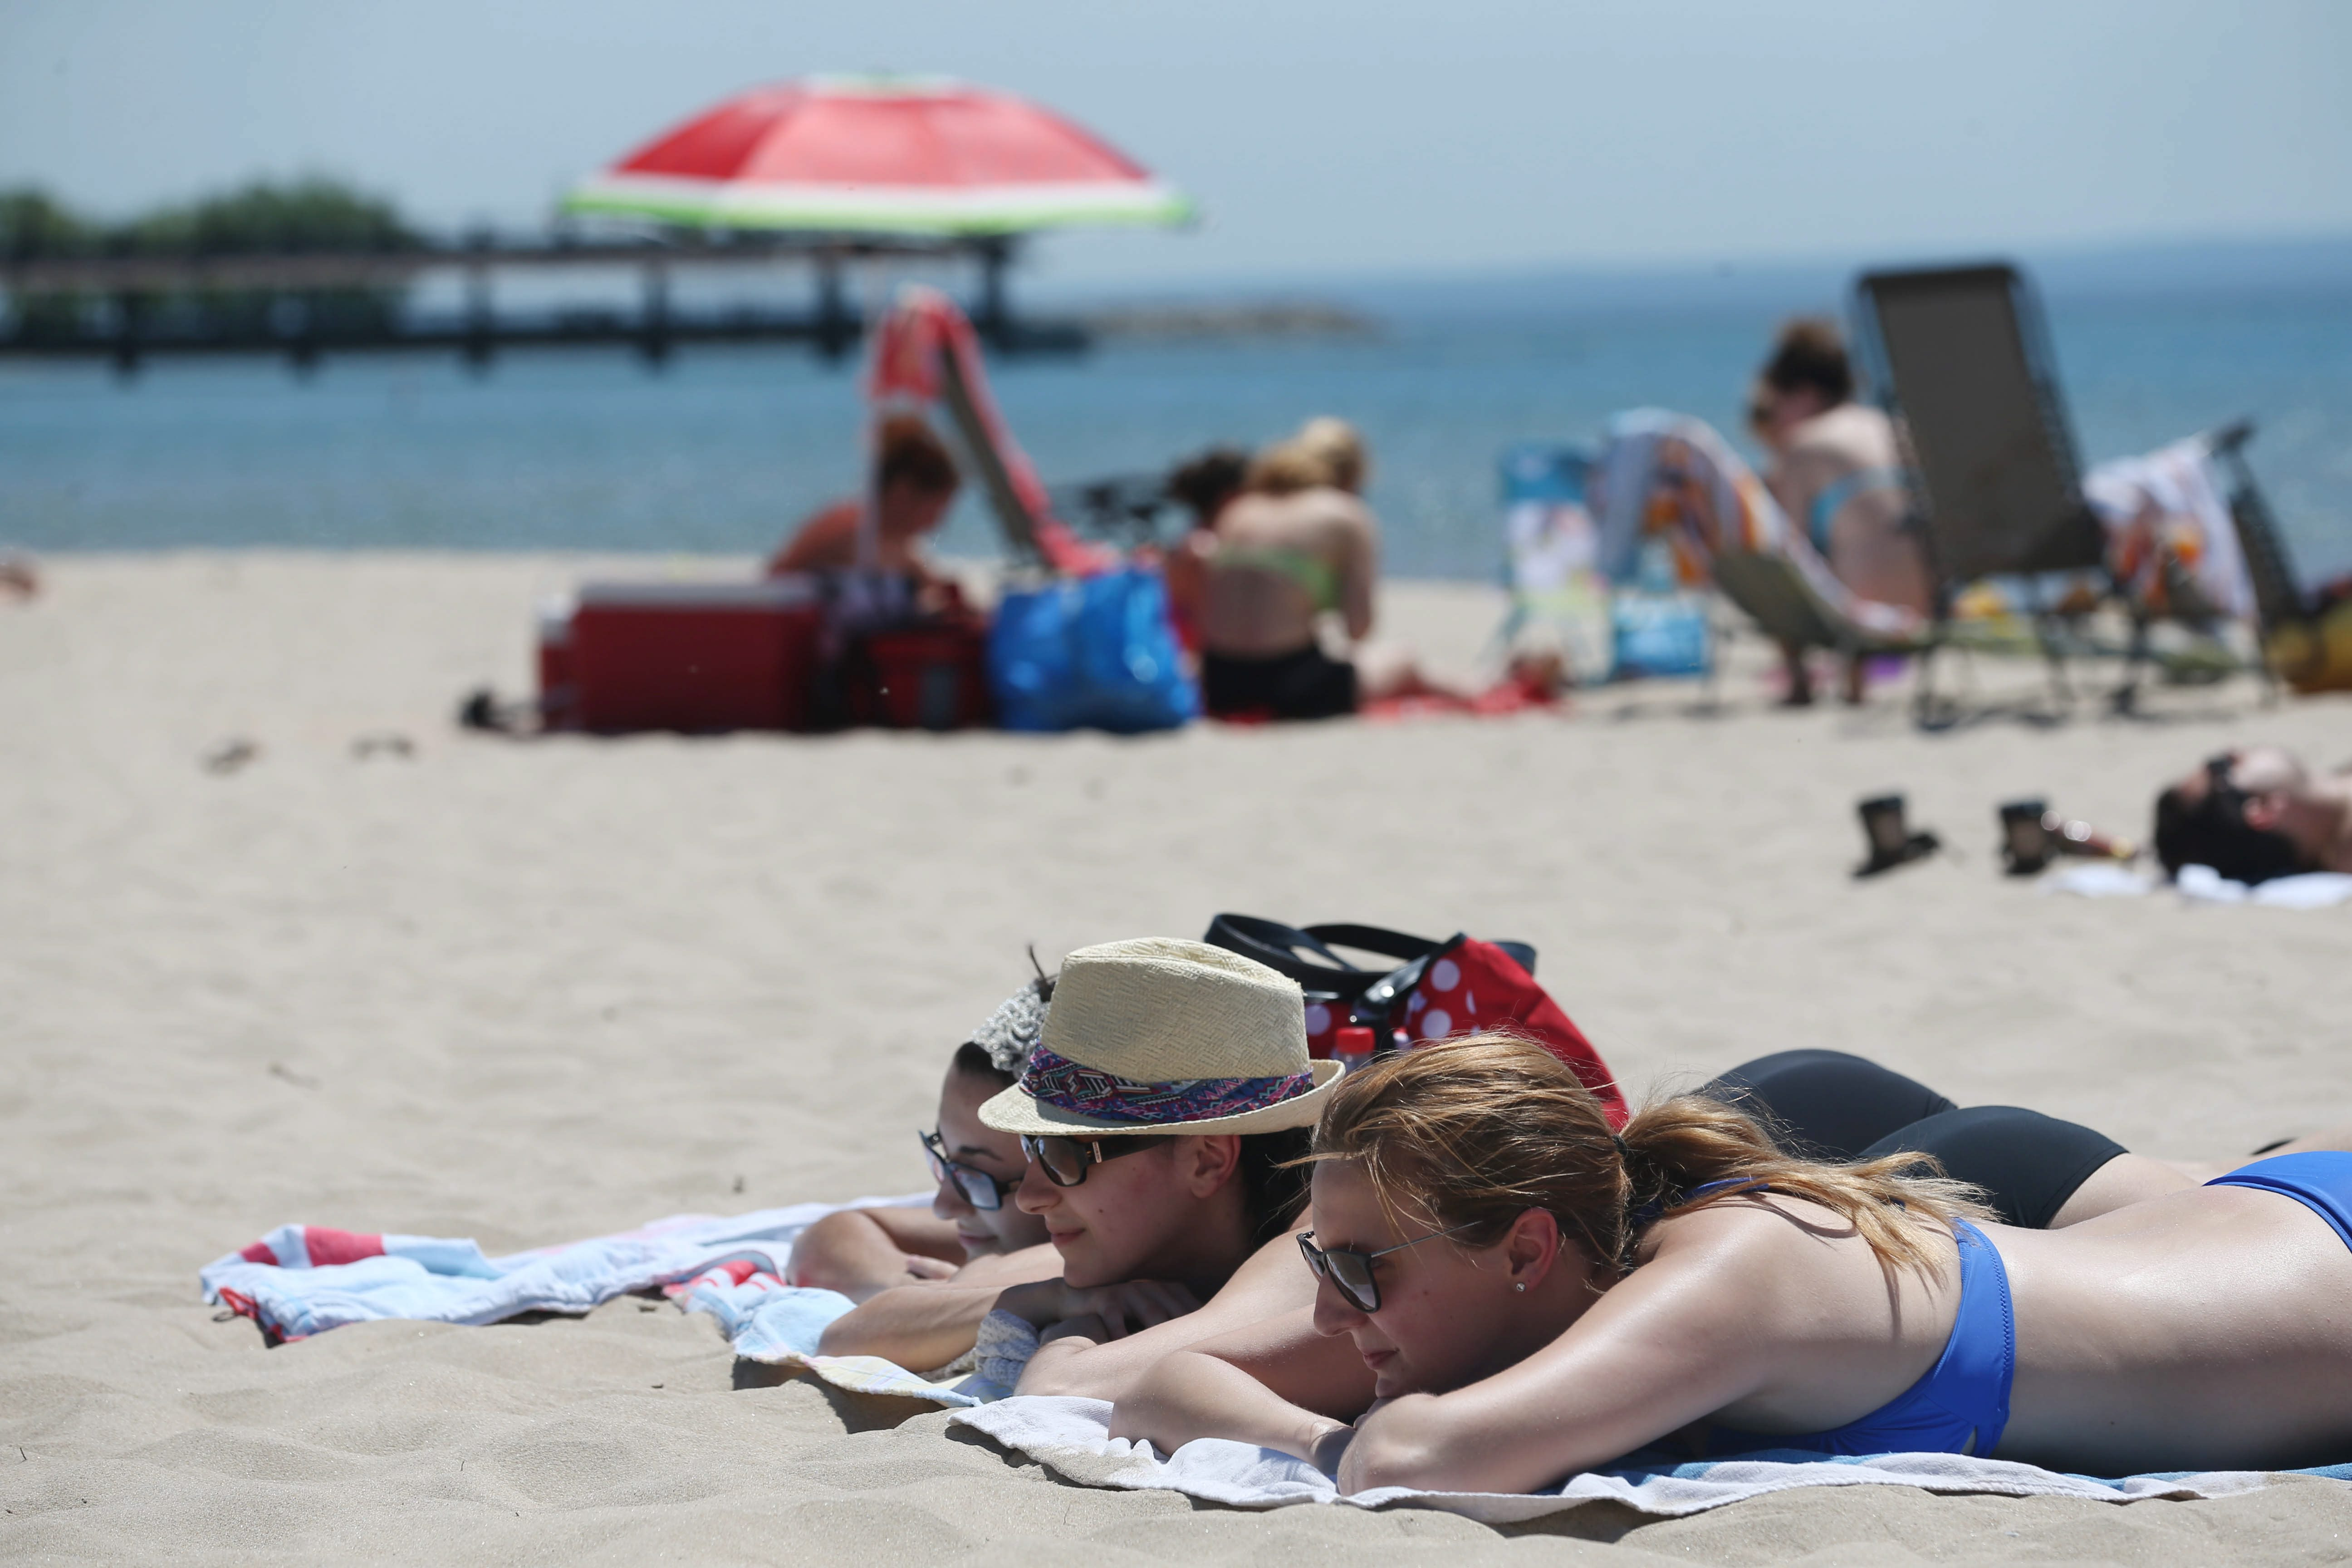 It's been one hot summer around the Buffalo Niagara region, and here at Crystal Beach, Ont. (Sharon Cantillon/Buffalo News)